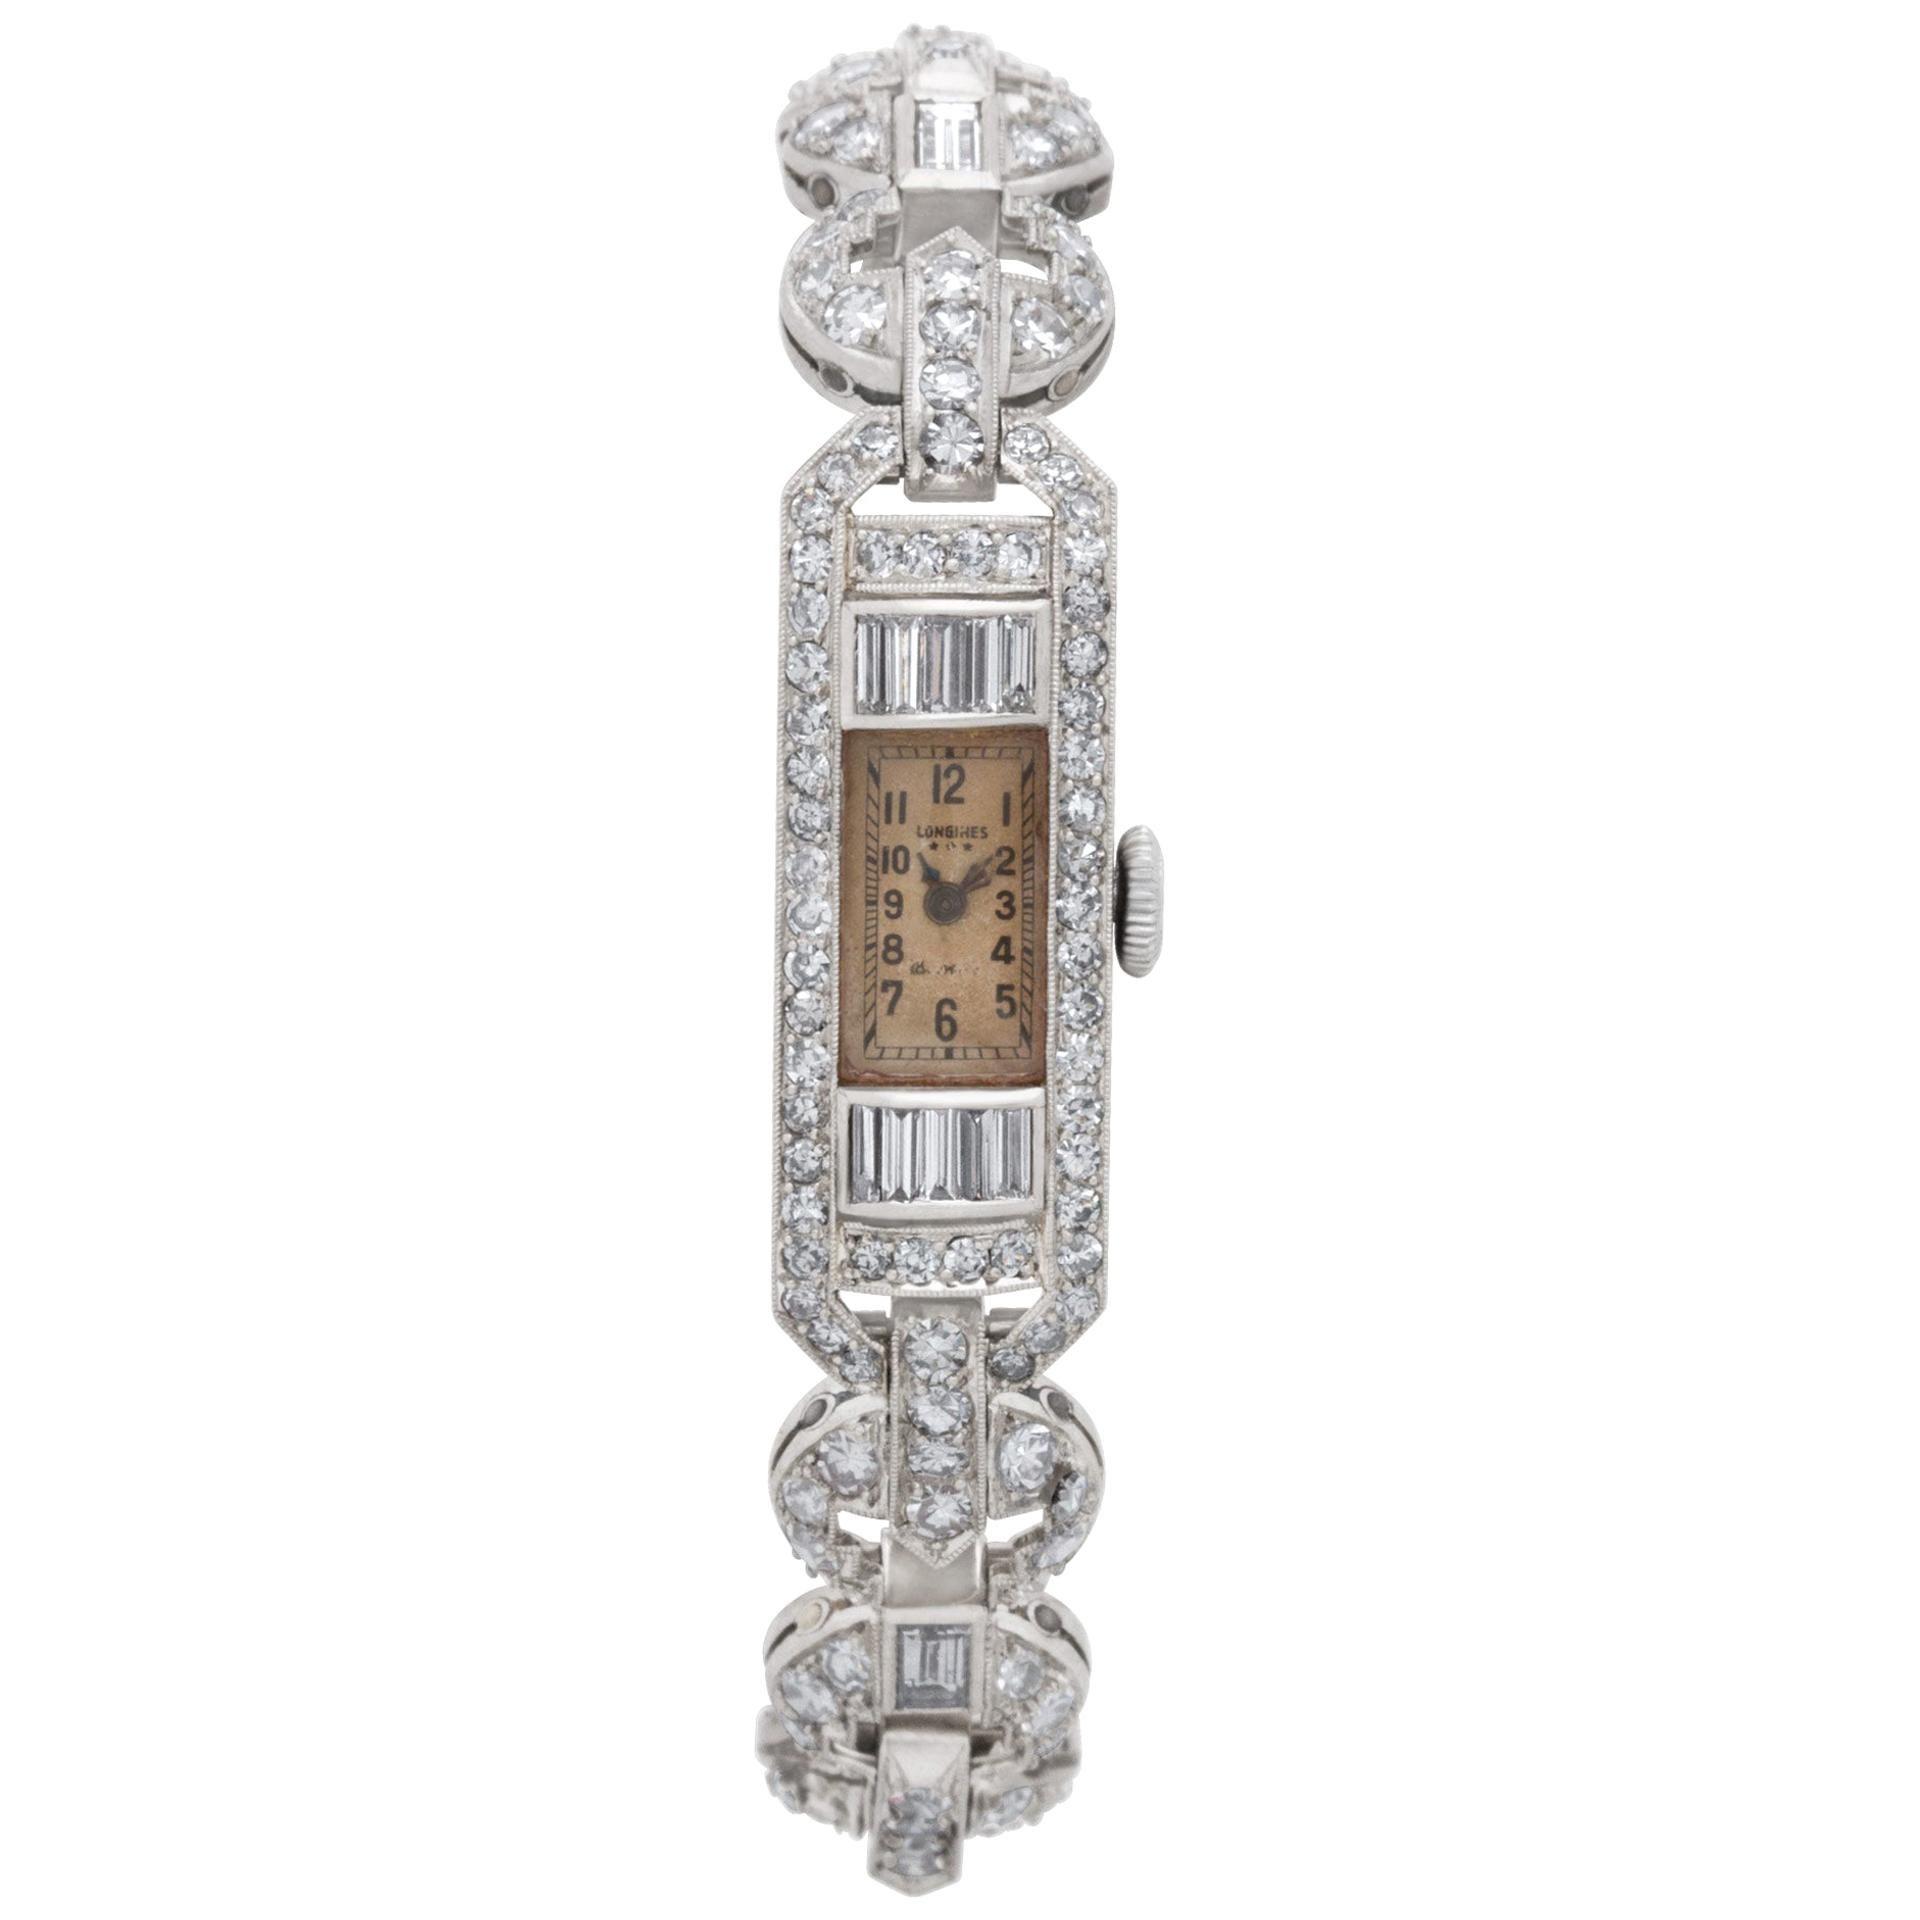 Longines LDS Platinum Manual Watch